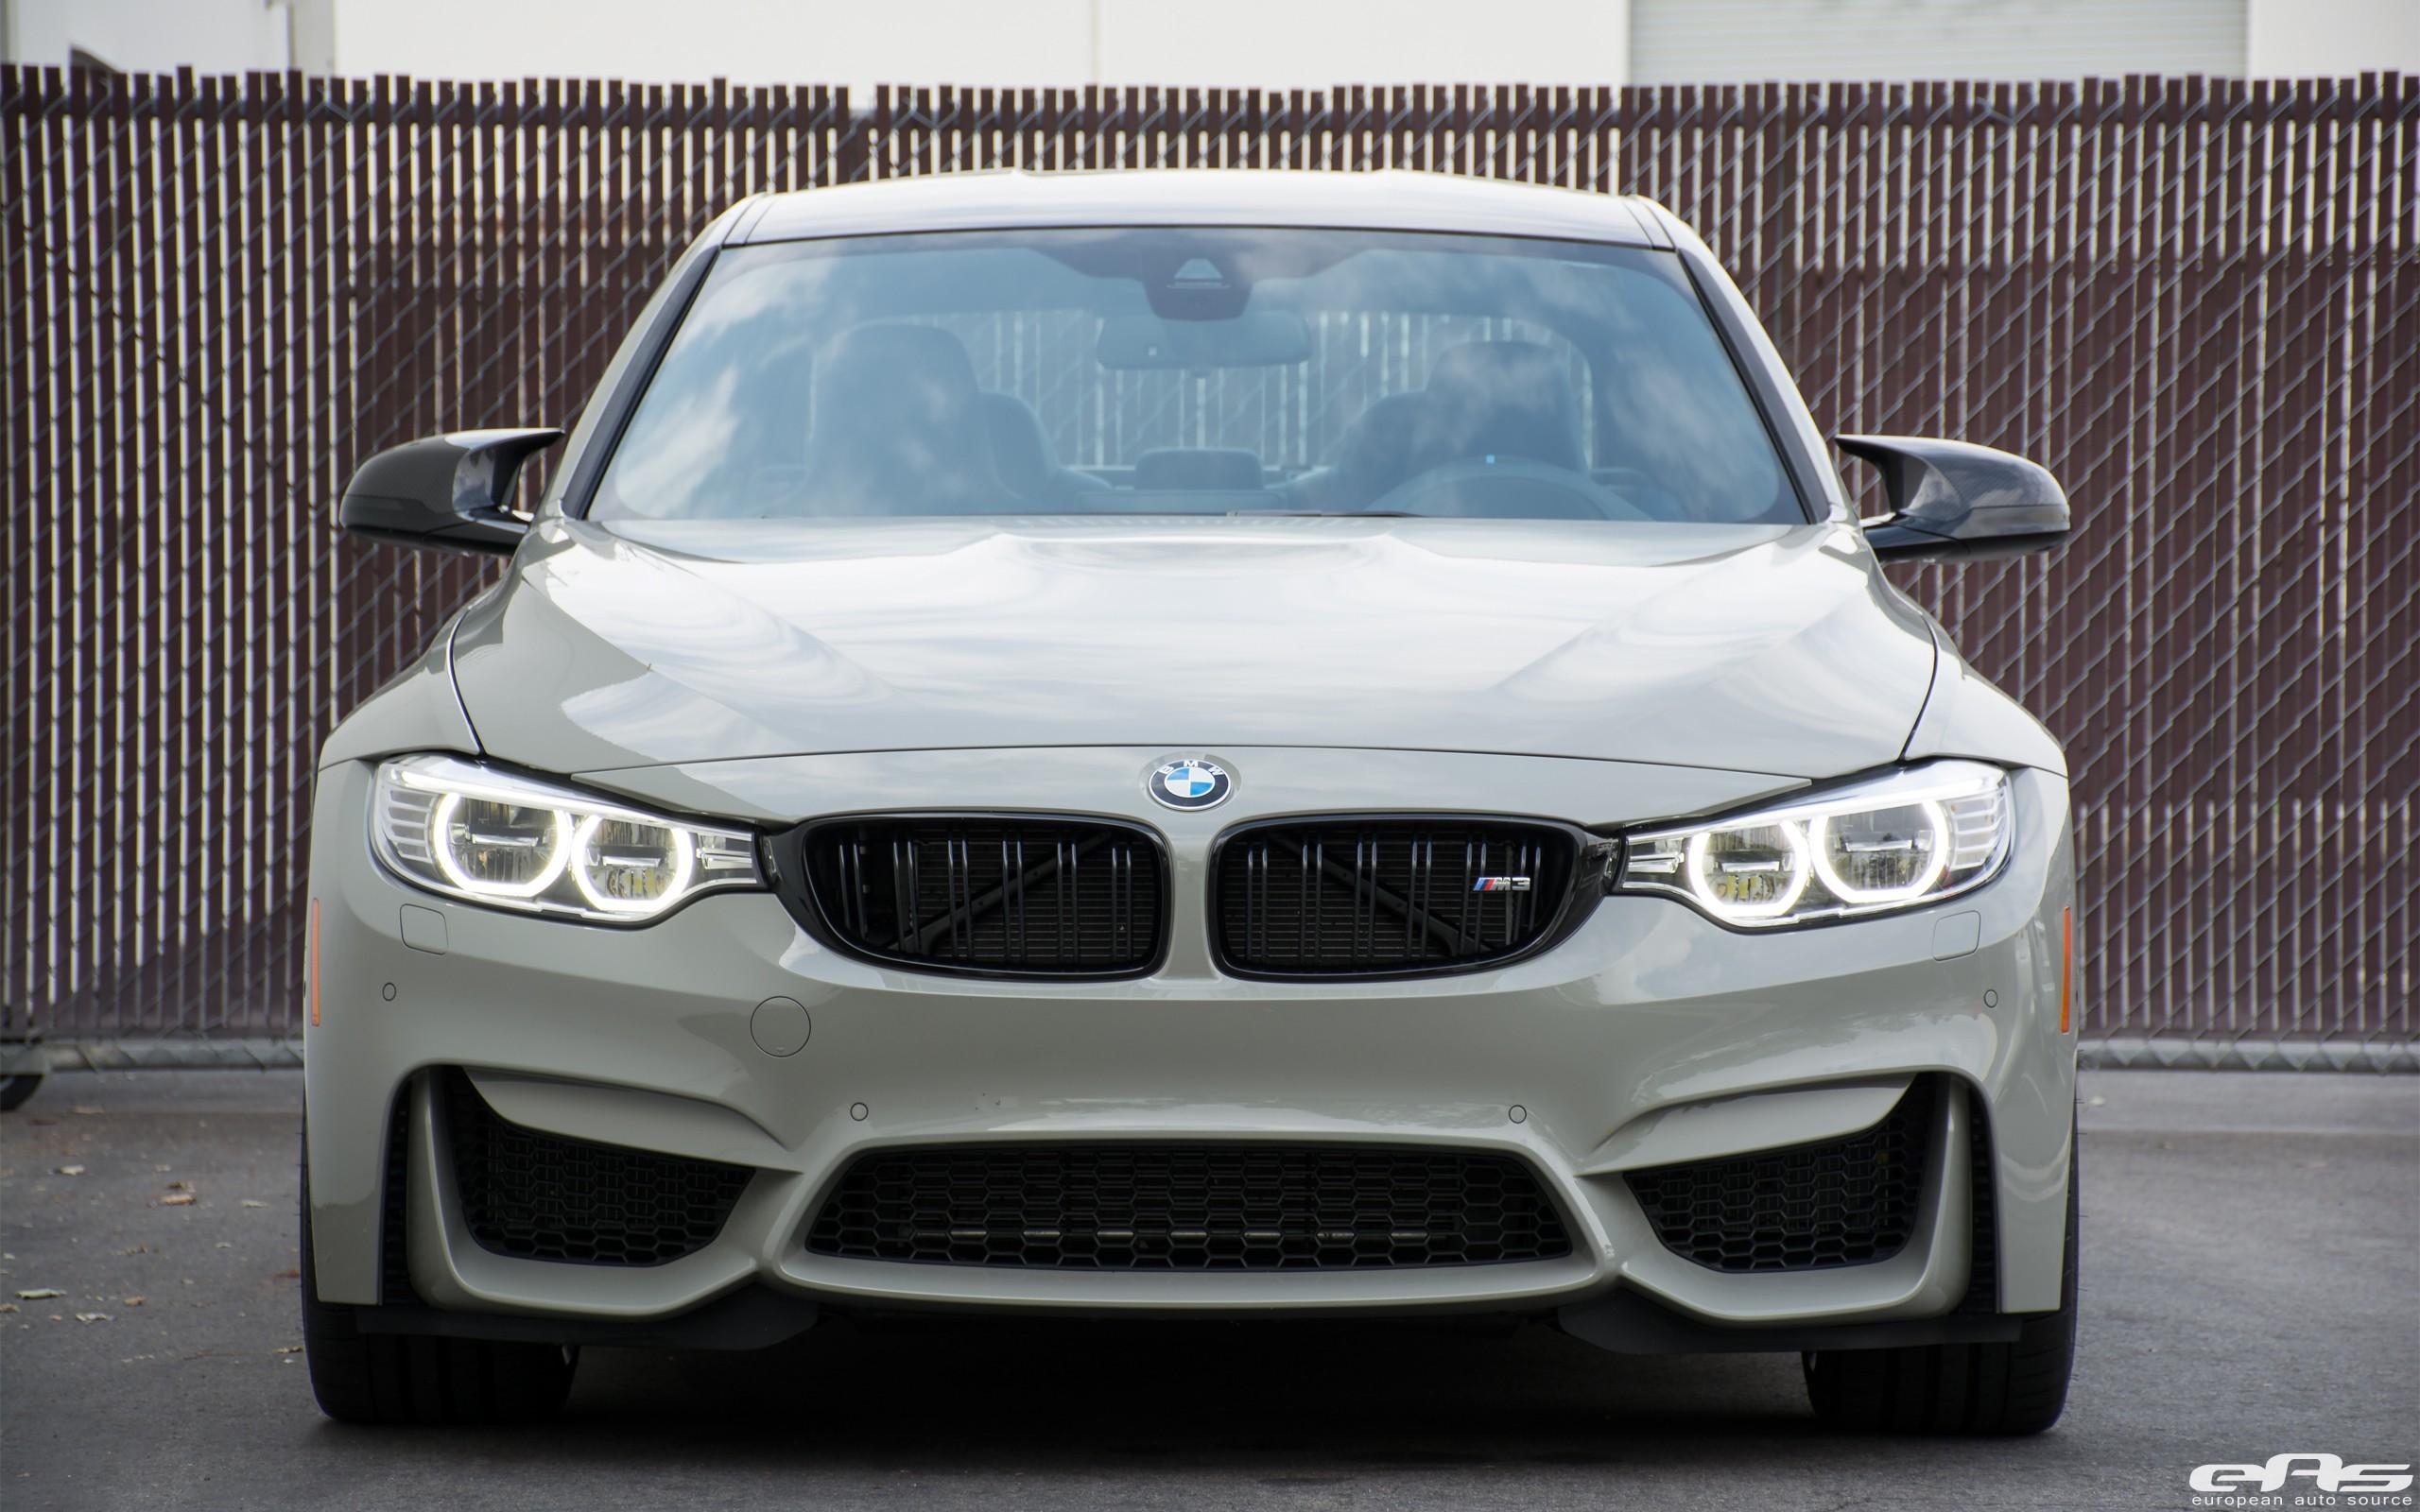 Fashion Grey BMW F80 M3 Has A Fjord Blue Interior And Its